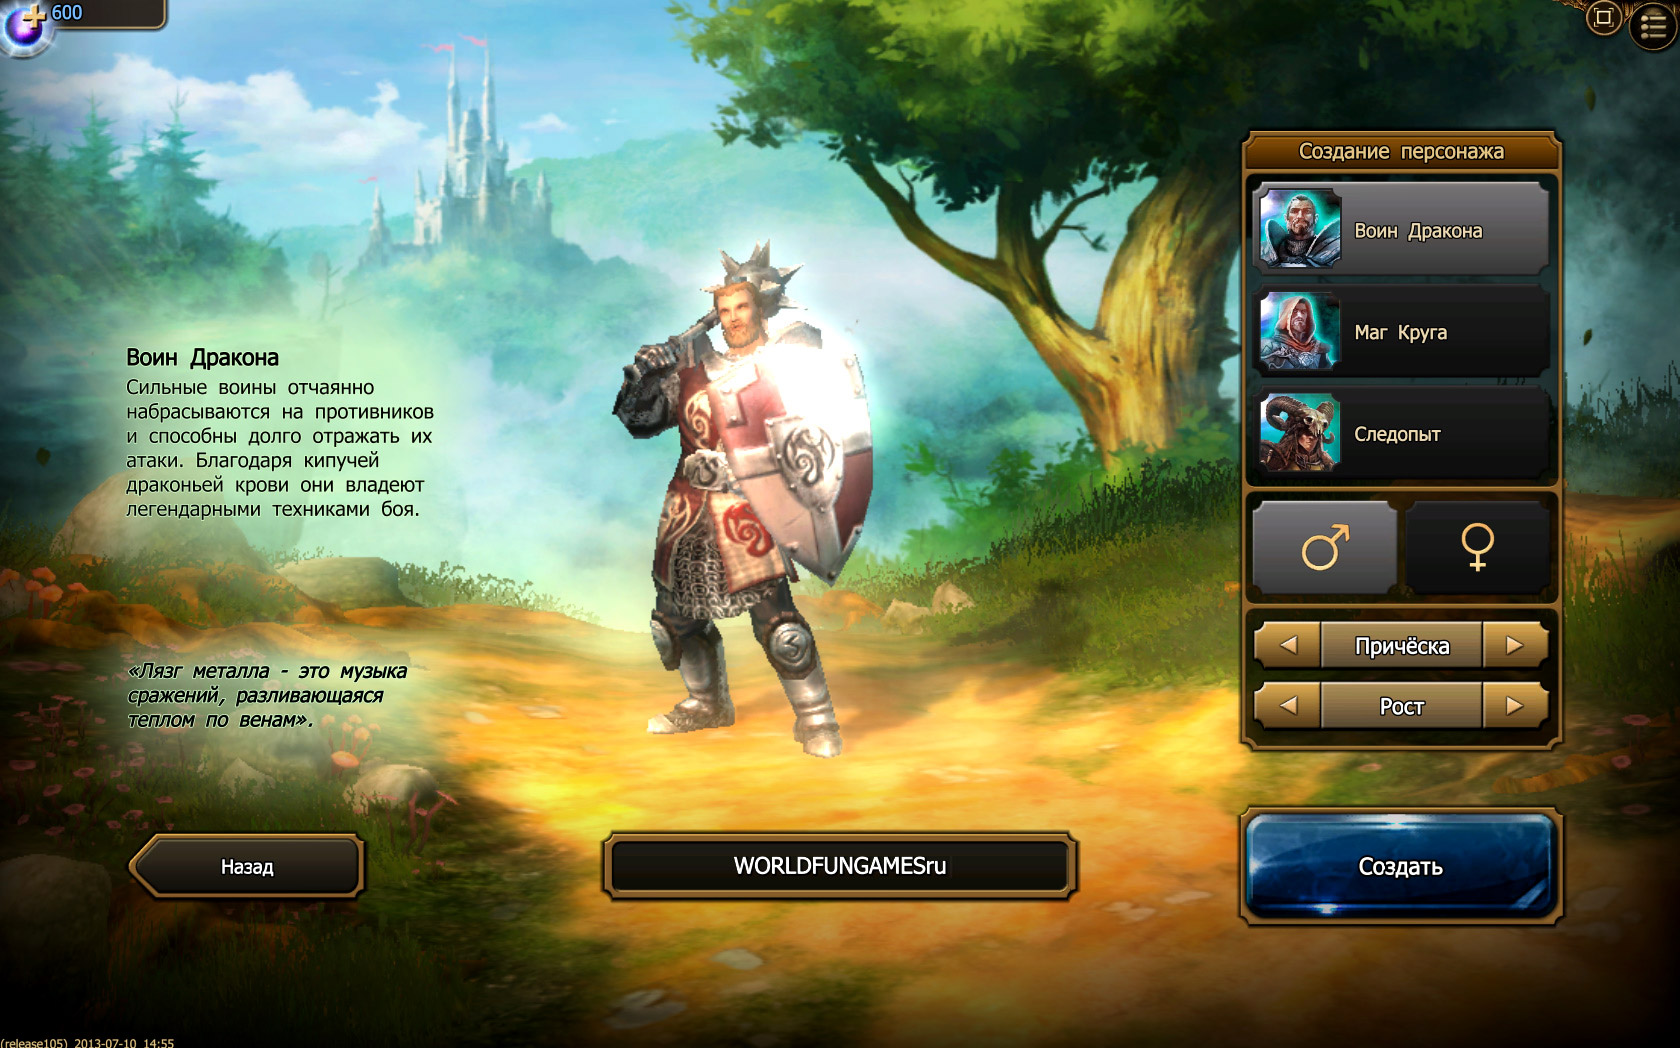 WorldfunGames_Drakensang Online 4